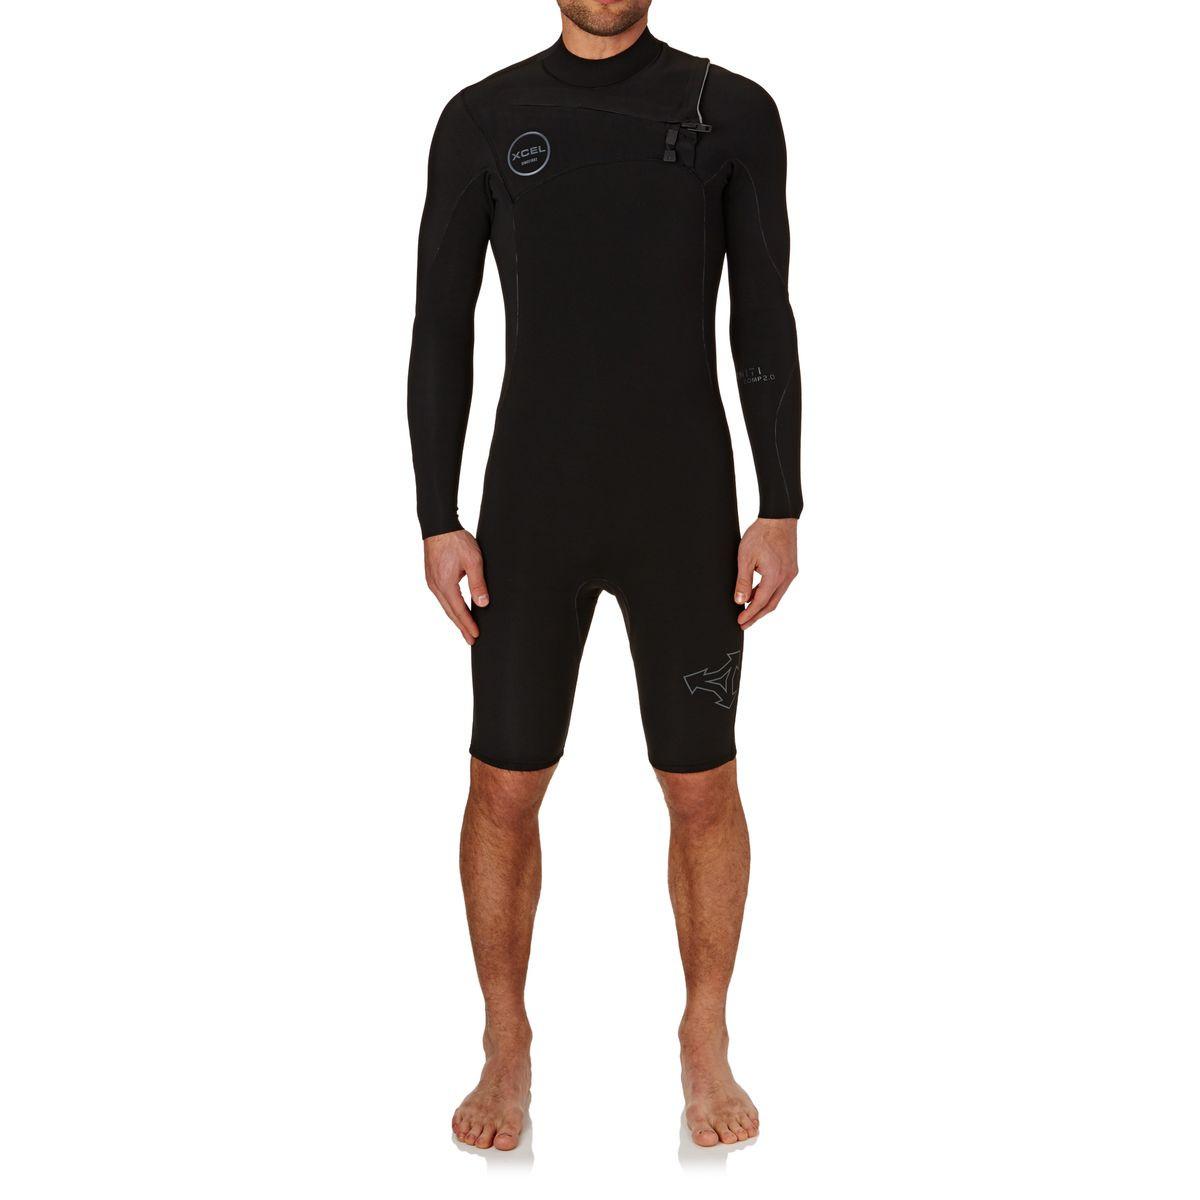 Xcel Infiniti Comp 2mm 2017 Long Sleeve Chest Zip Wetsuit - Black